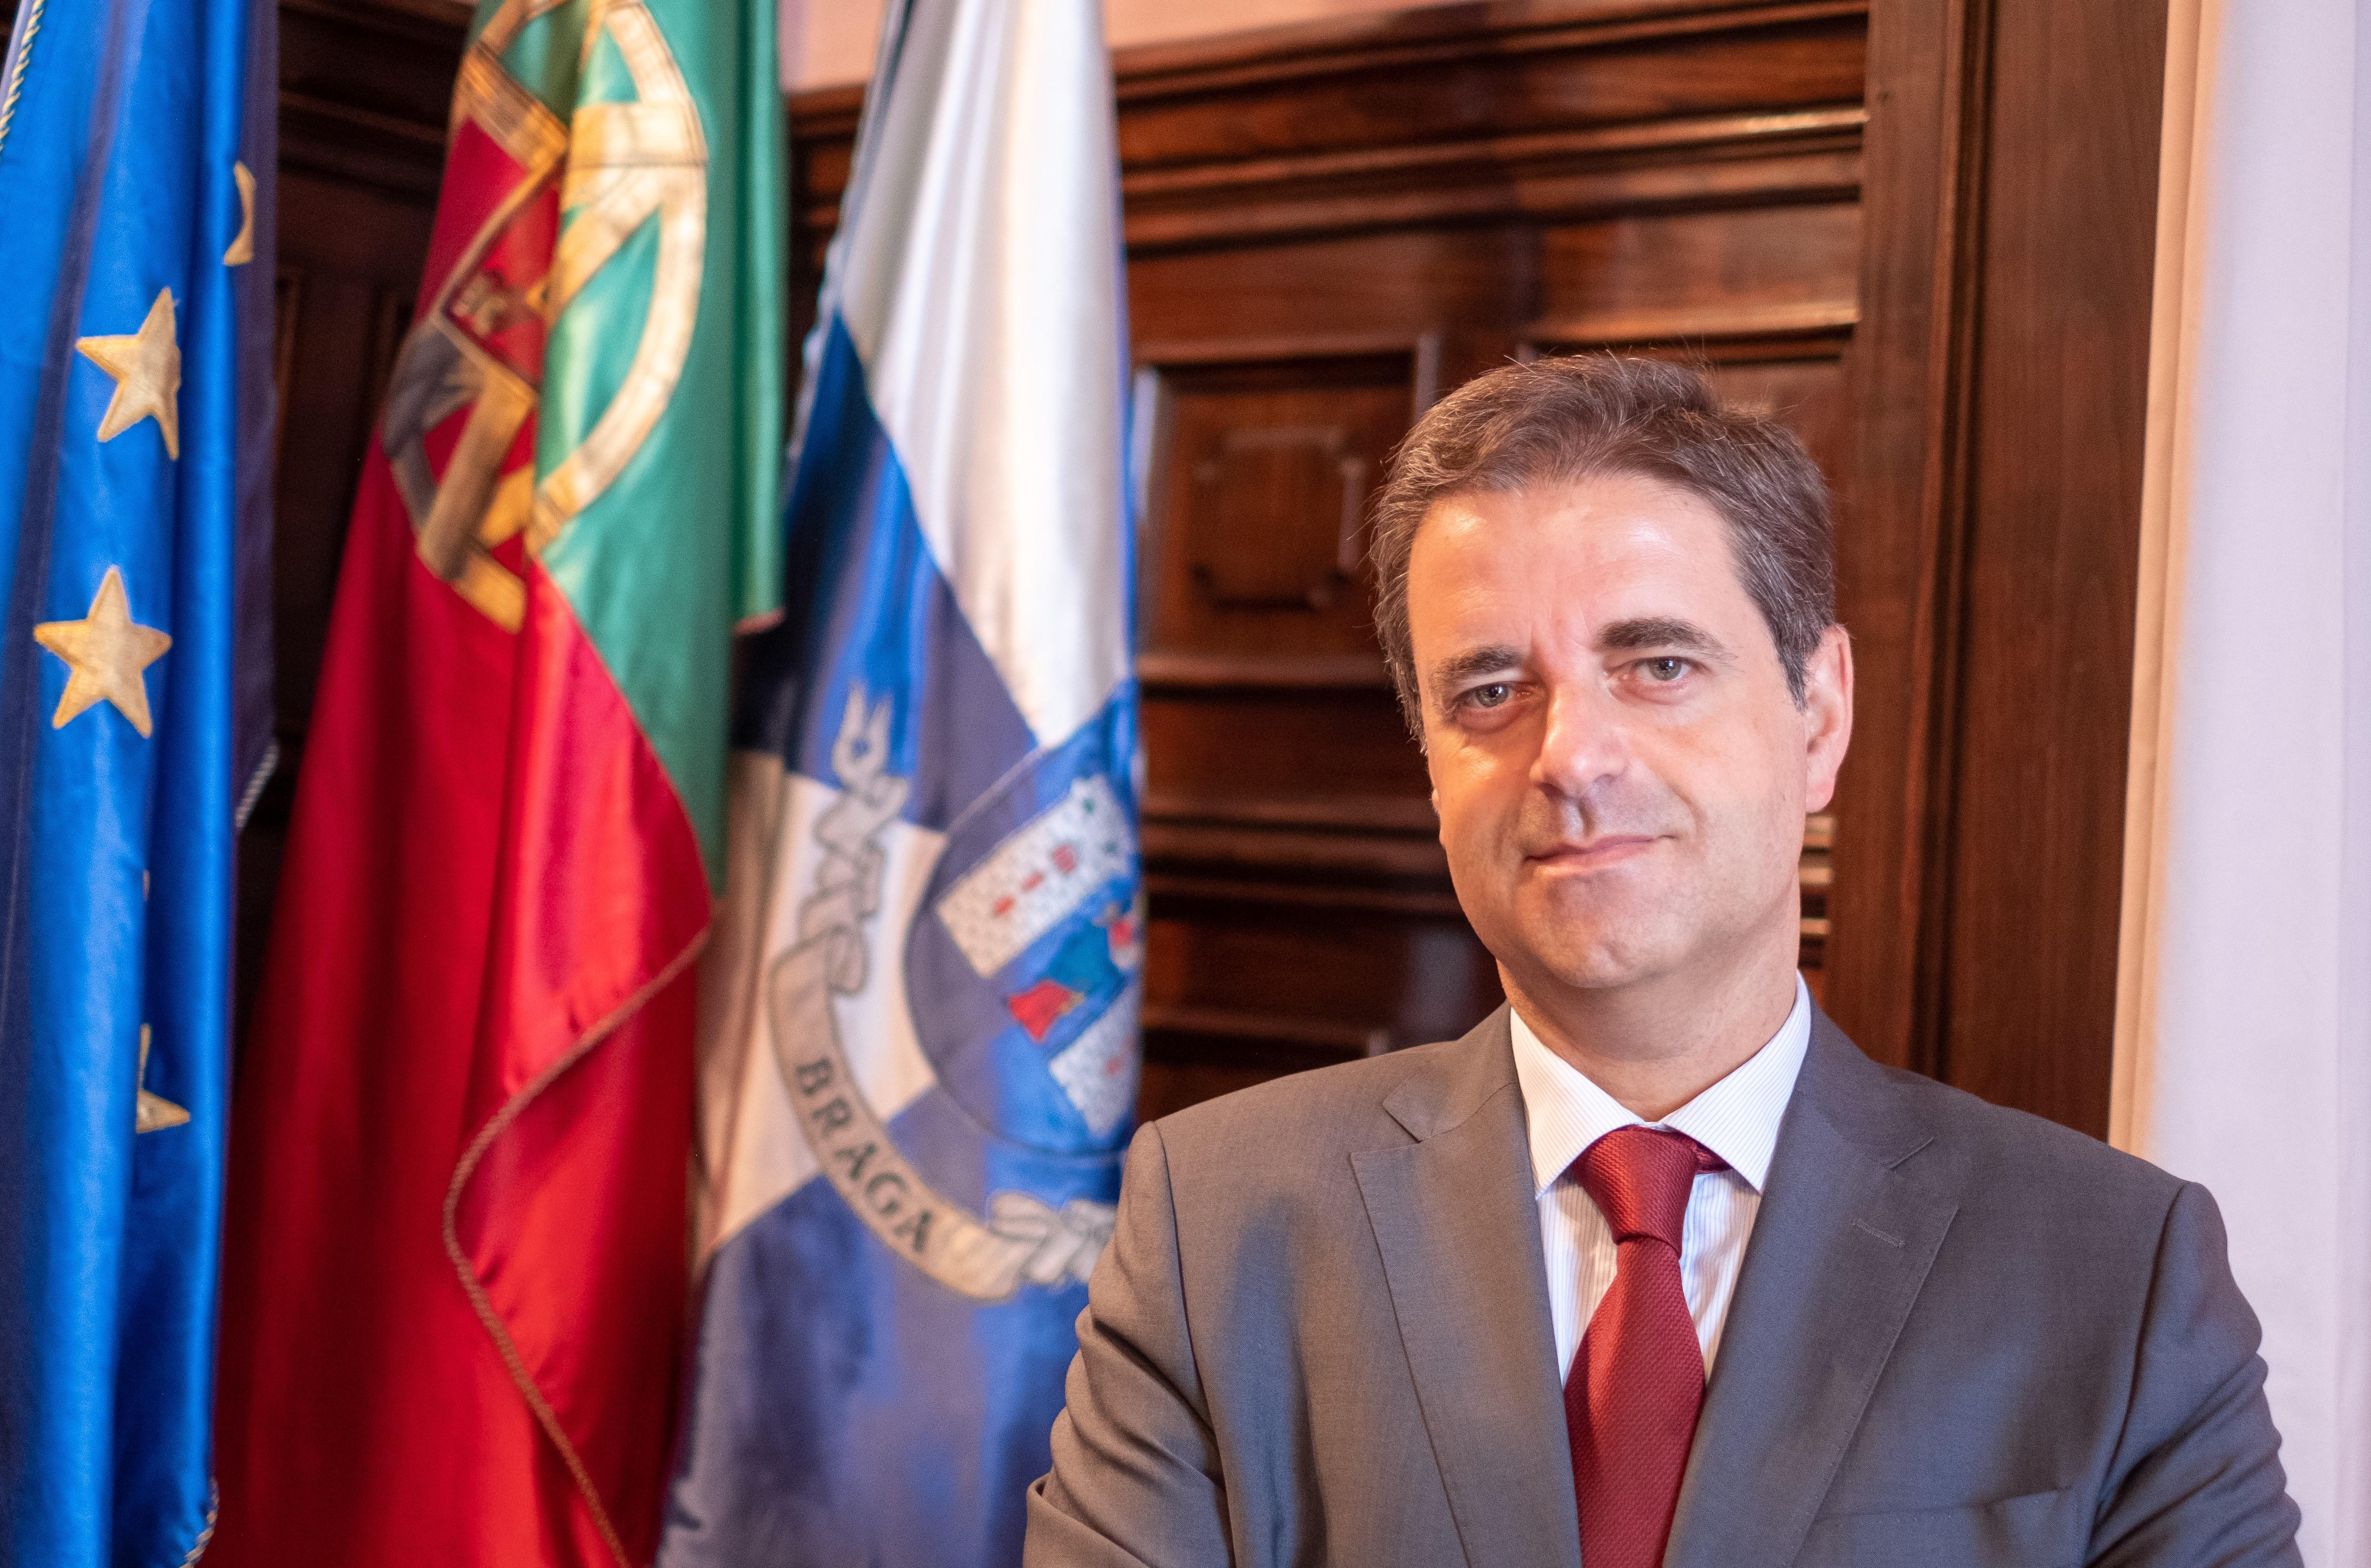 Presidente, Ricardo Rio. / Câmara Municipal de Braga